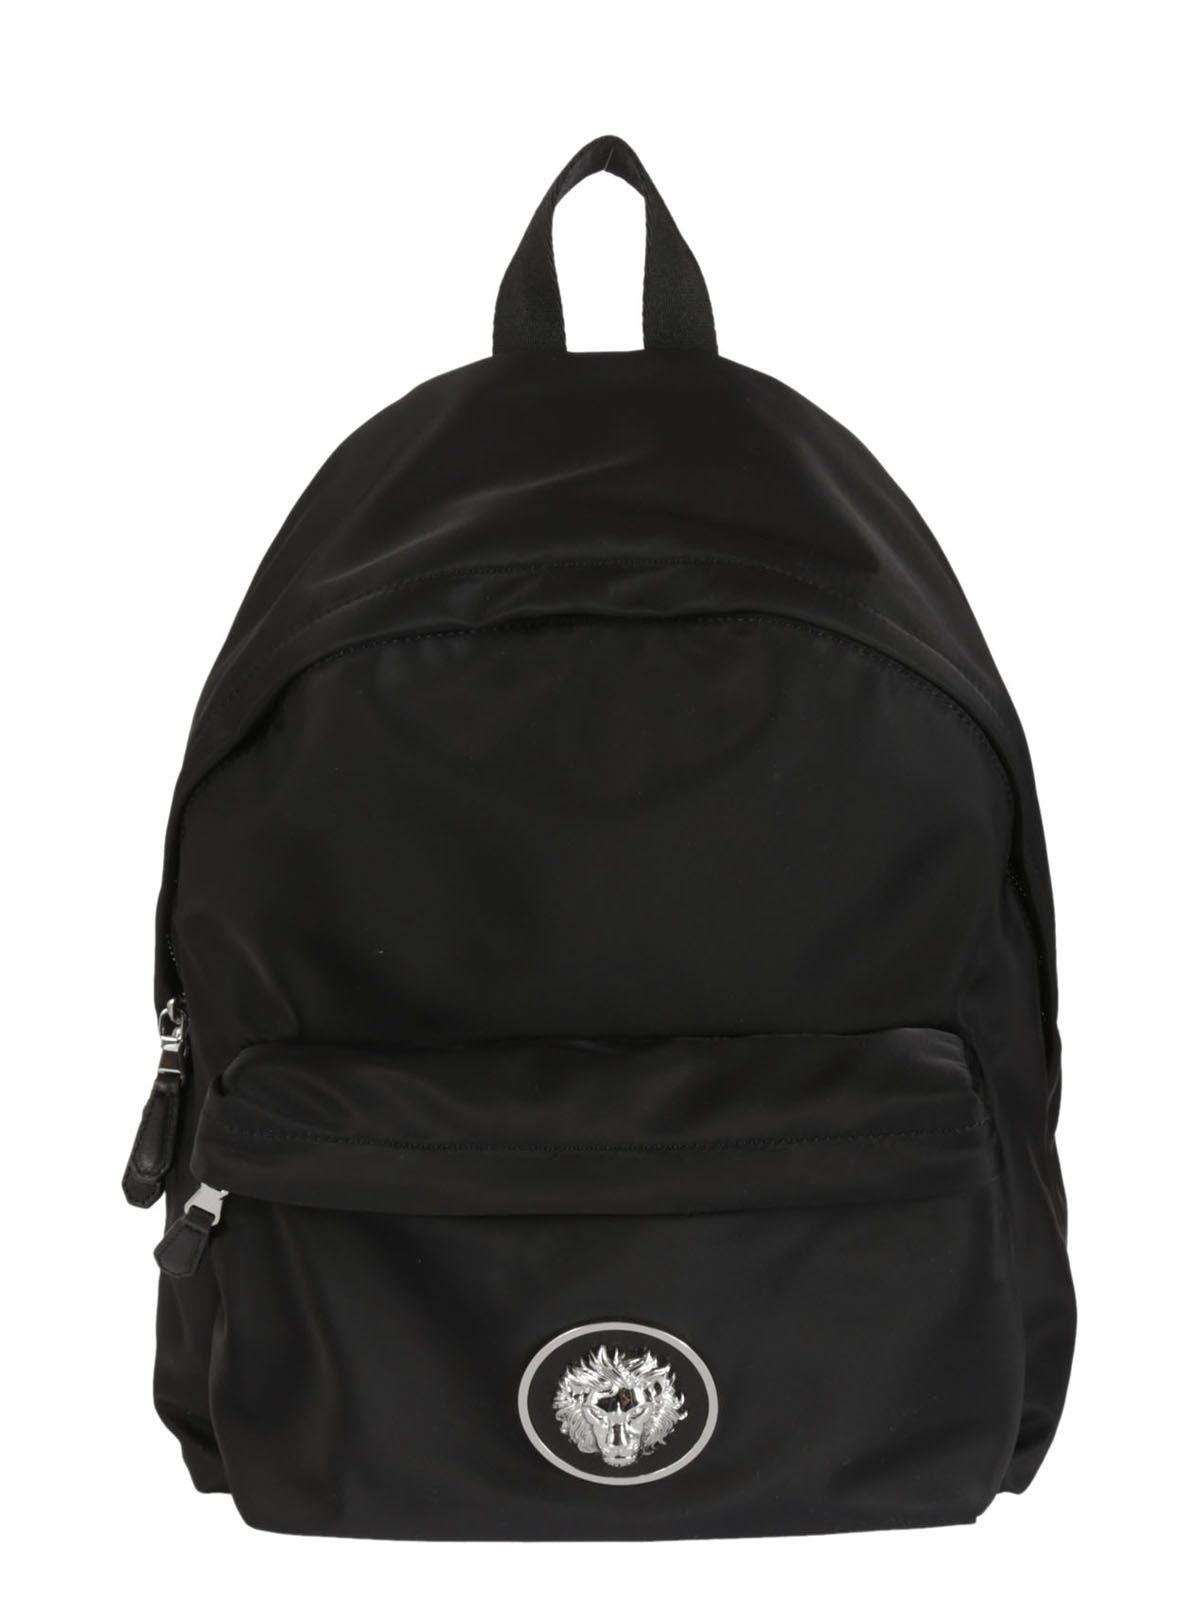 Versus Large Lion Head Backpack